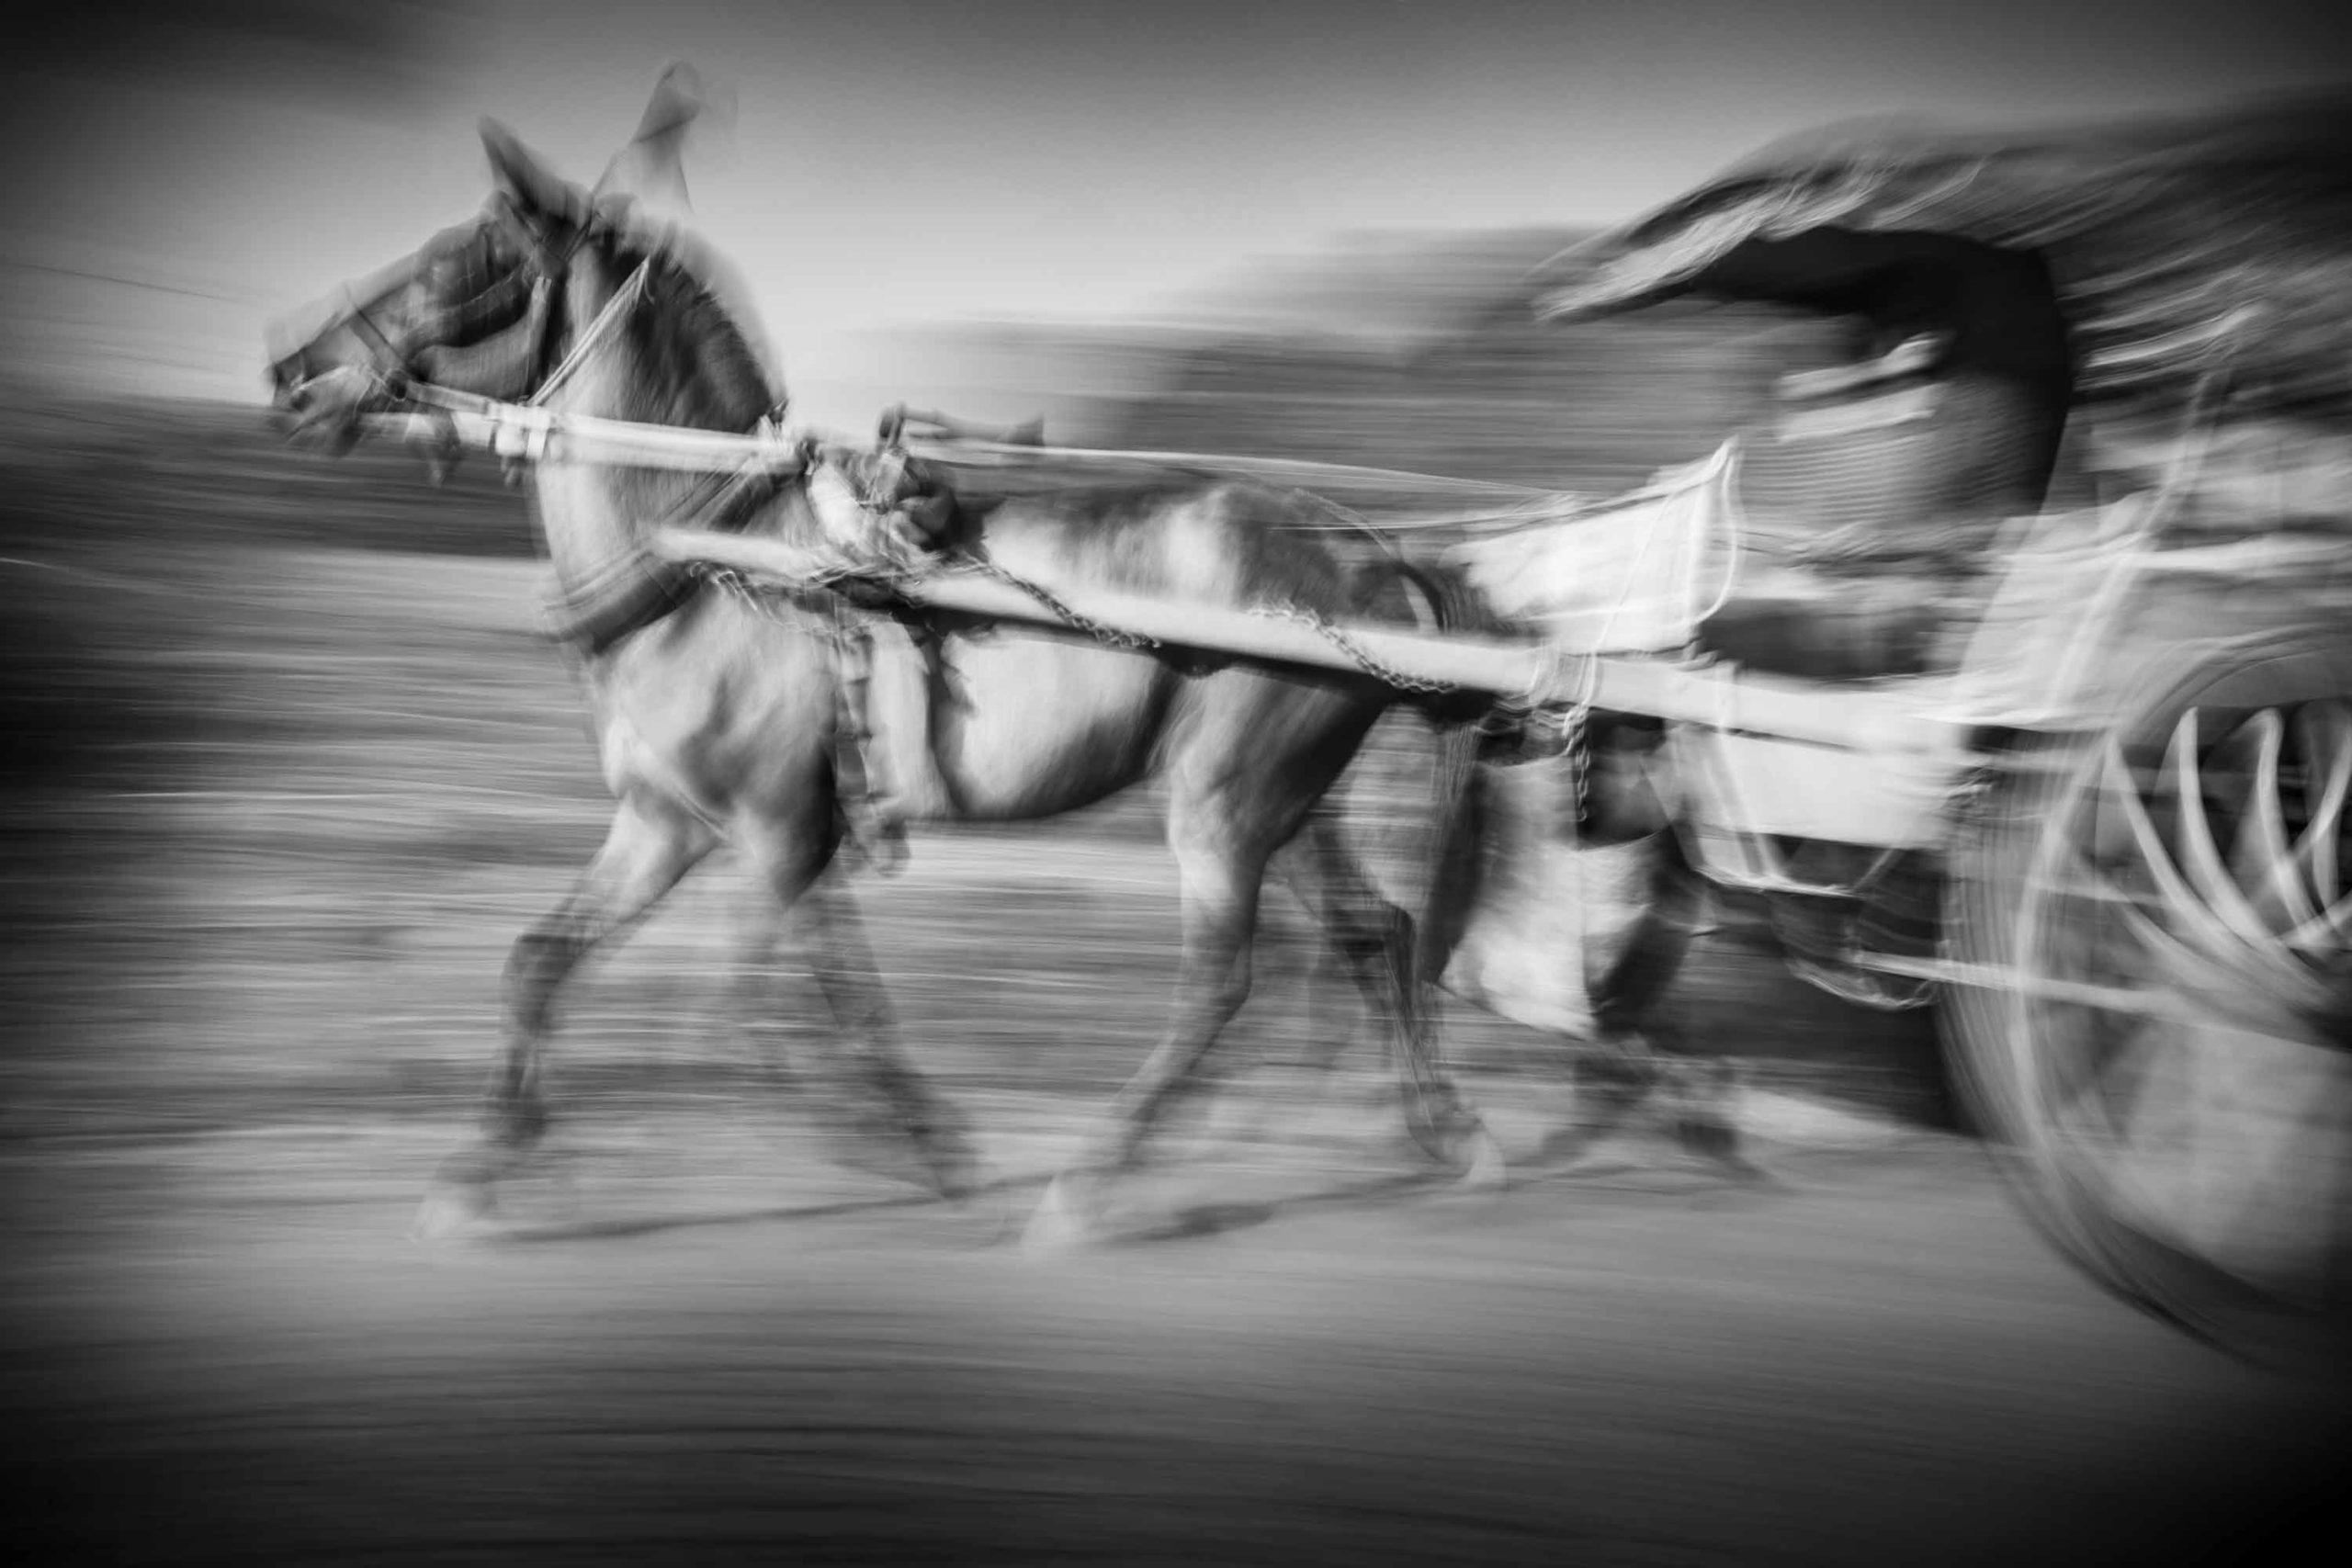 Horse, Mandalay Inwa, Myanmar (Burma)